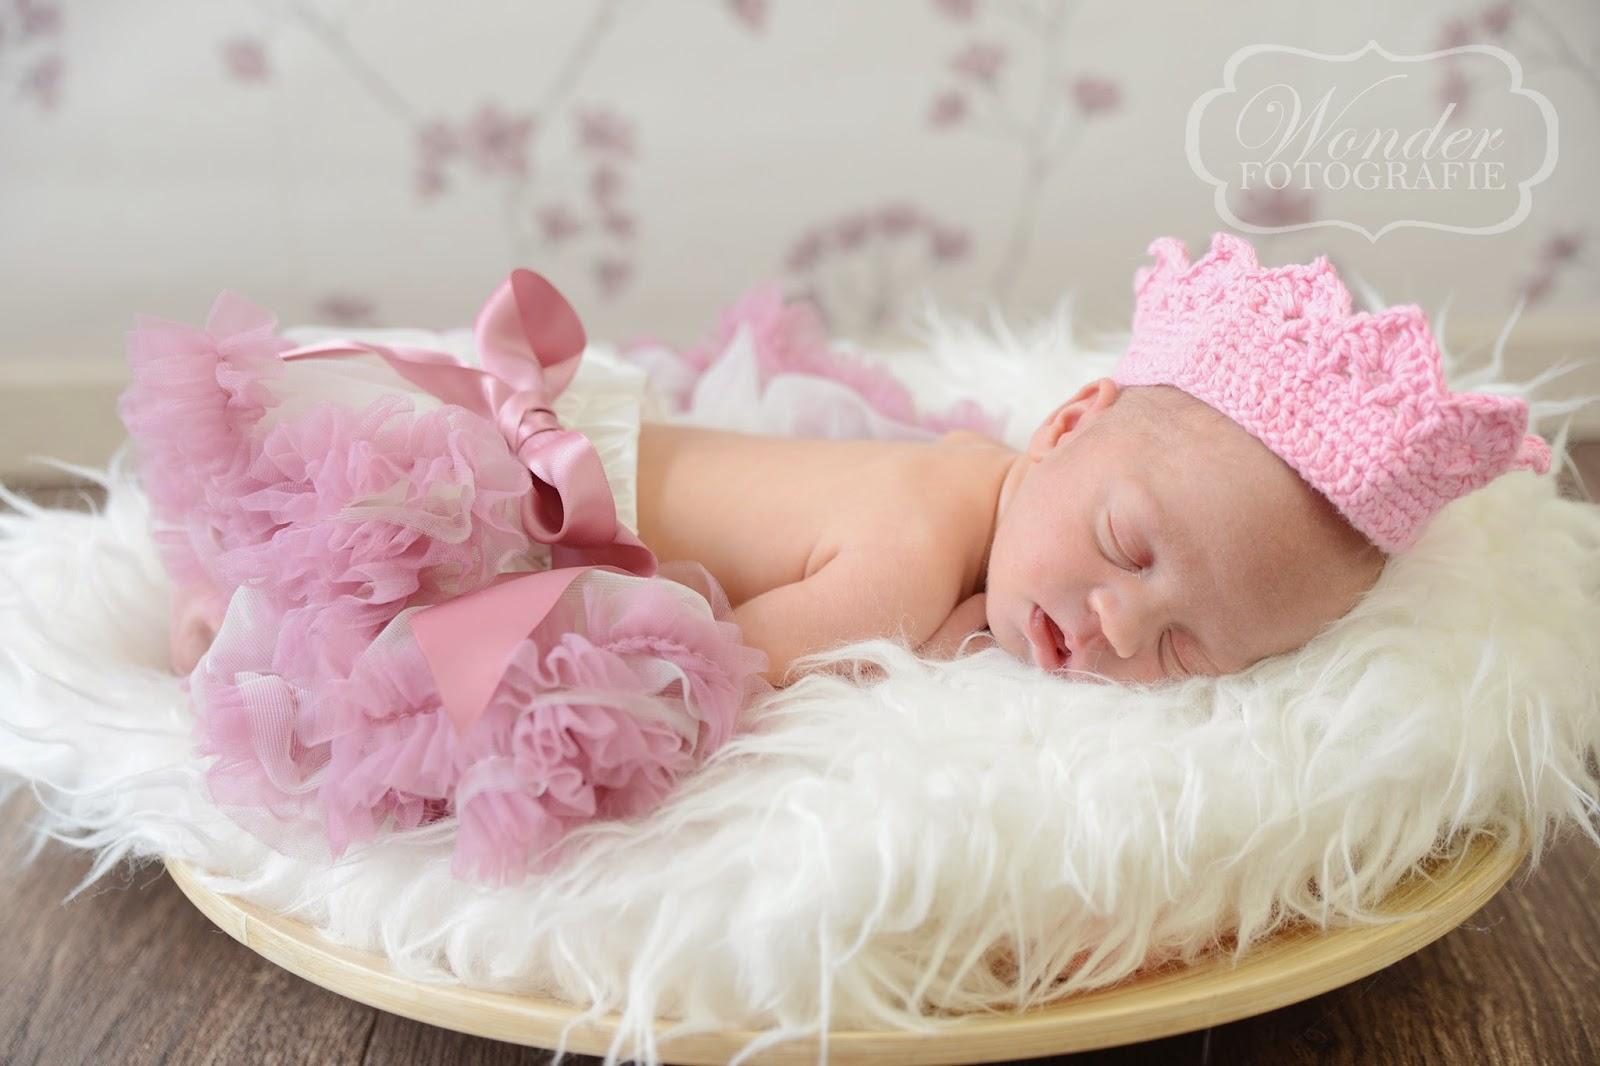 www.wonder-fotografie.nl Newborn Fotografie Almere